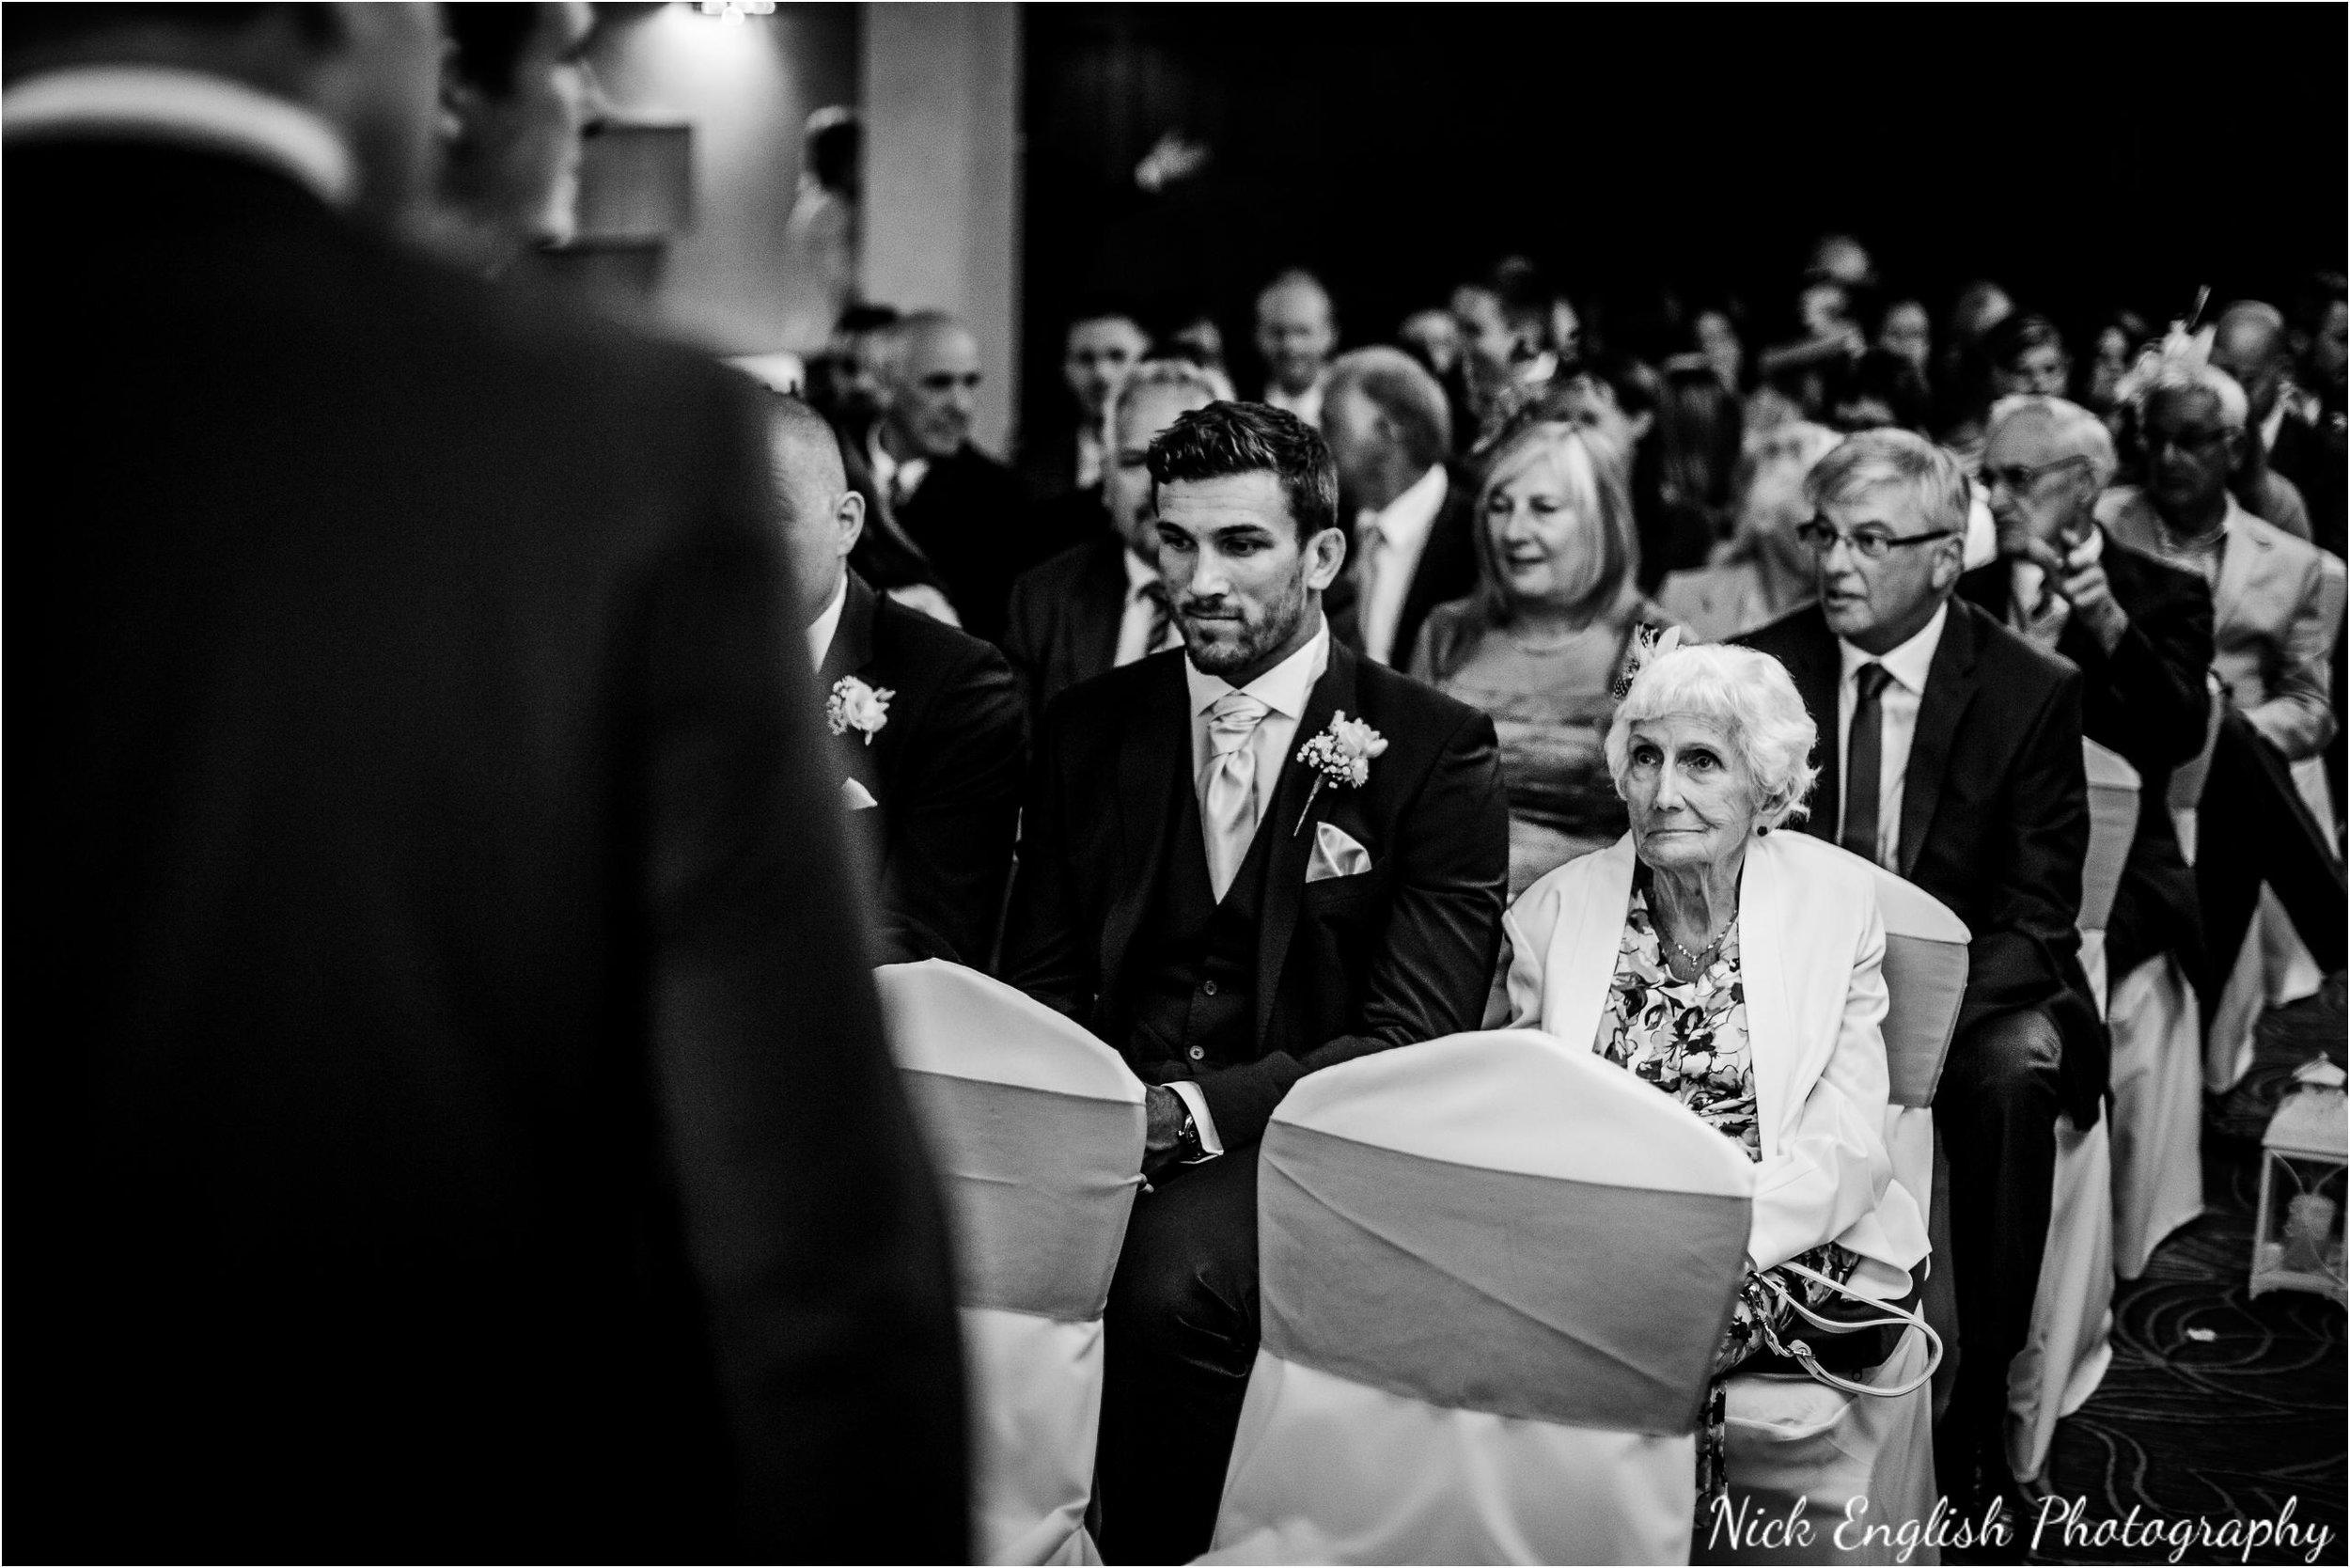 Emily David Wedding Photographs at Barton Grange Preston by Nick English Photography 55jpg.jpeg